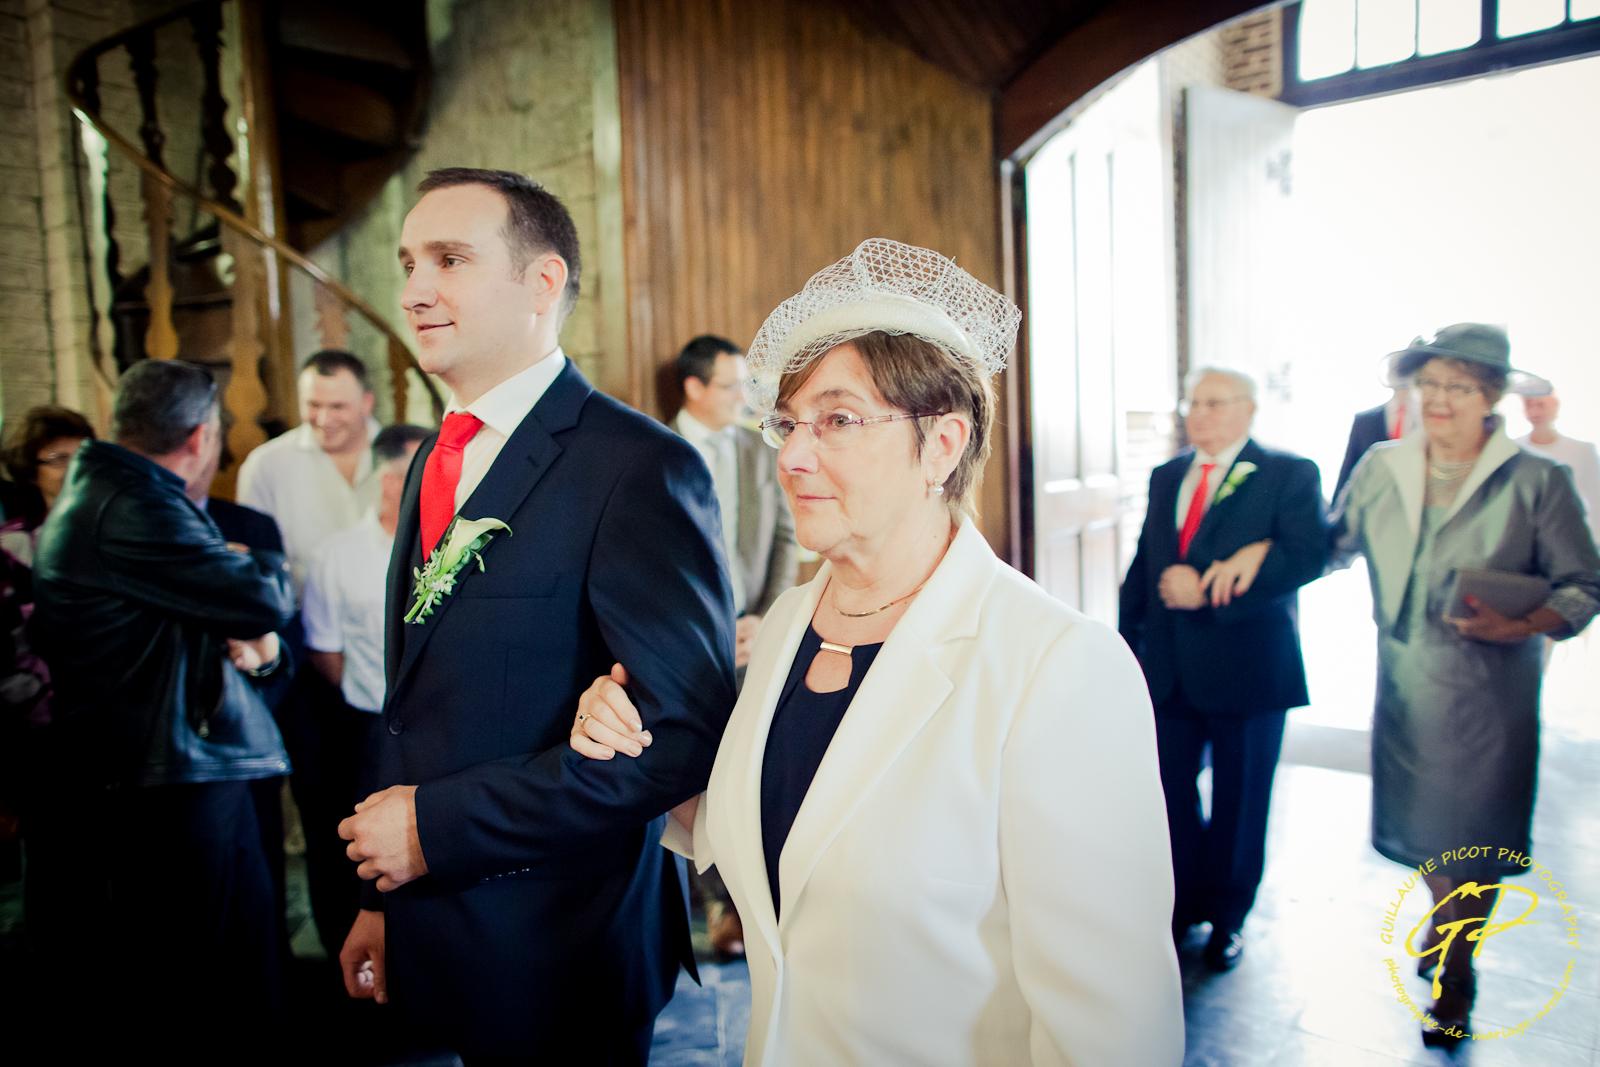 photographe mariage nord (43 sur 96)